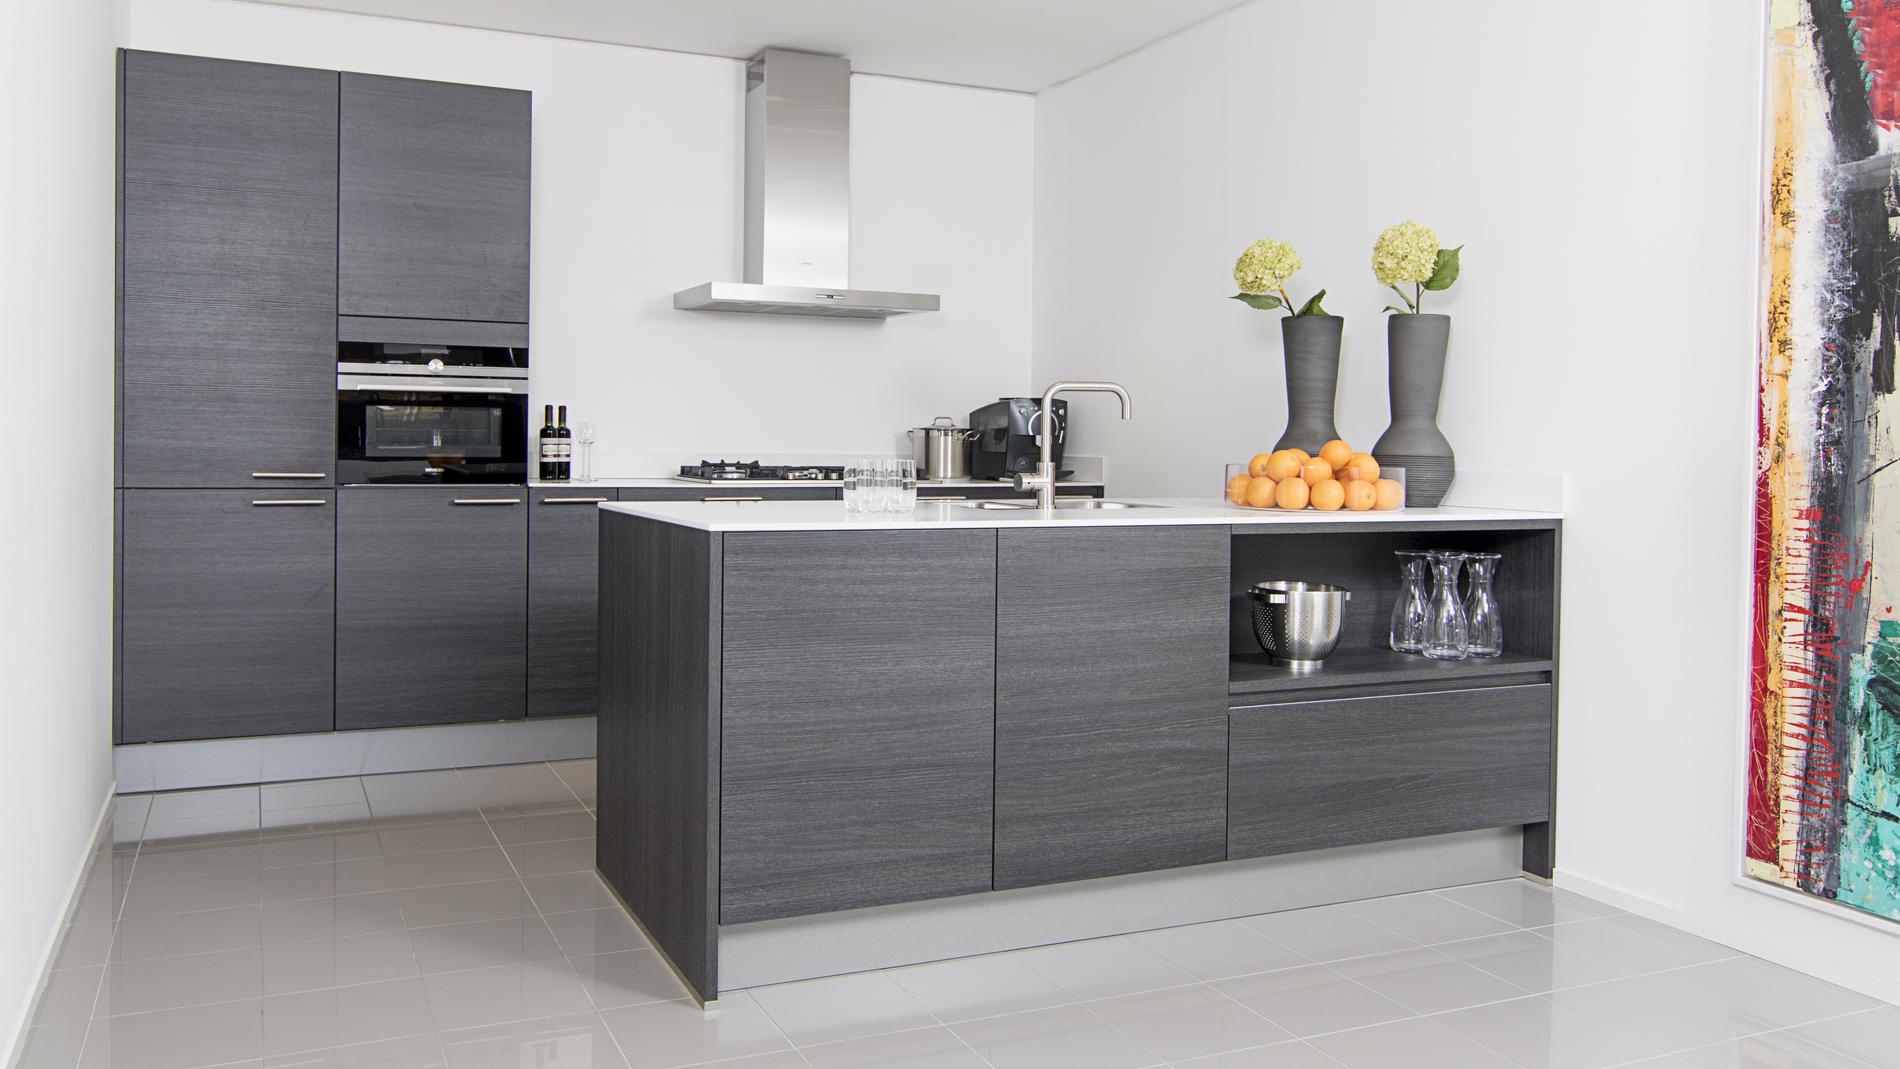 Design Keukens Showroommodellen : Design keukens aswa keukens